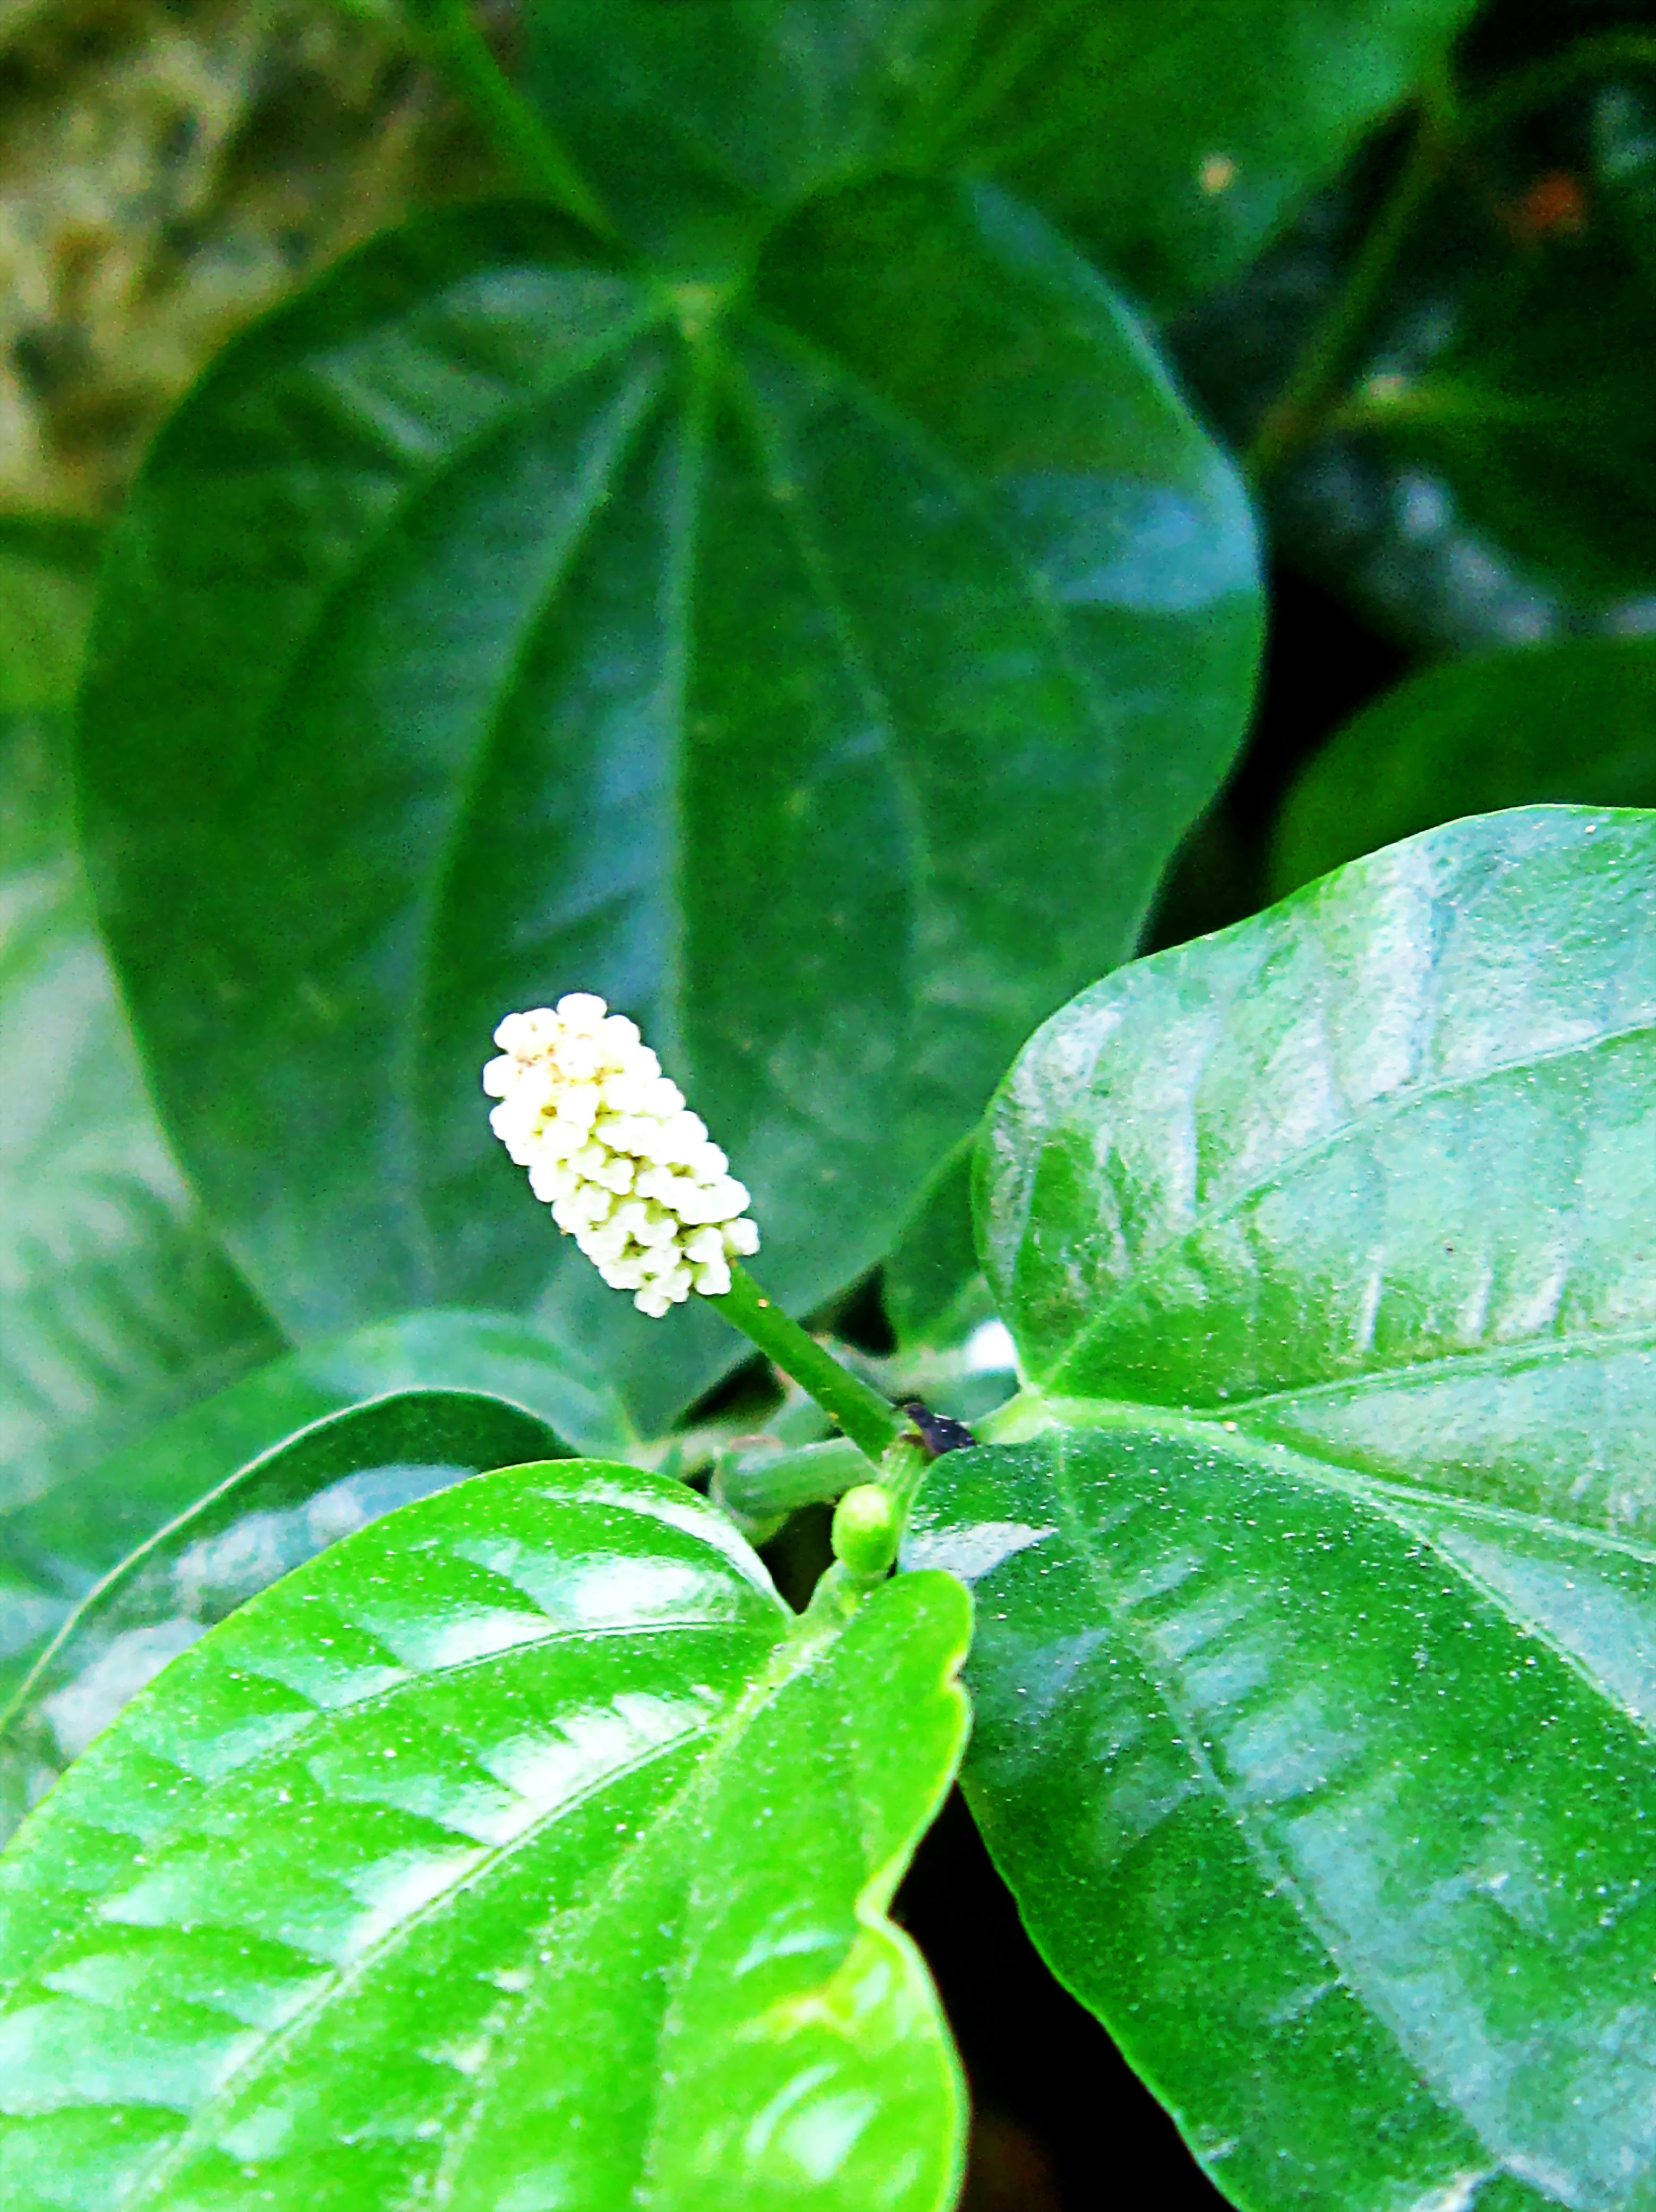 File:Hoa lá lốt.jpg - Wikimedia Commons